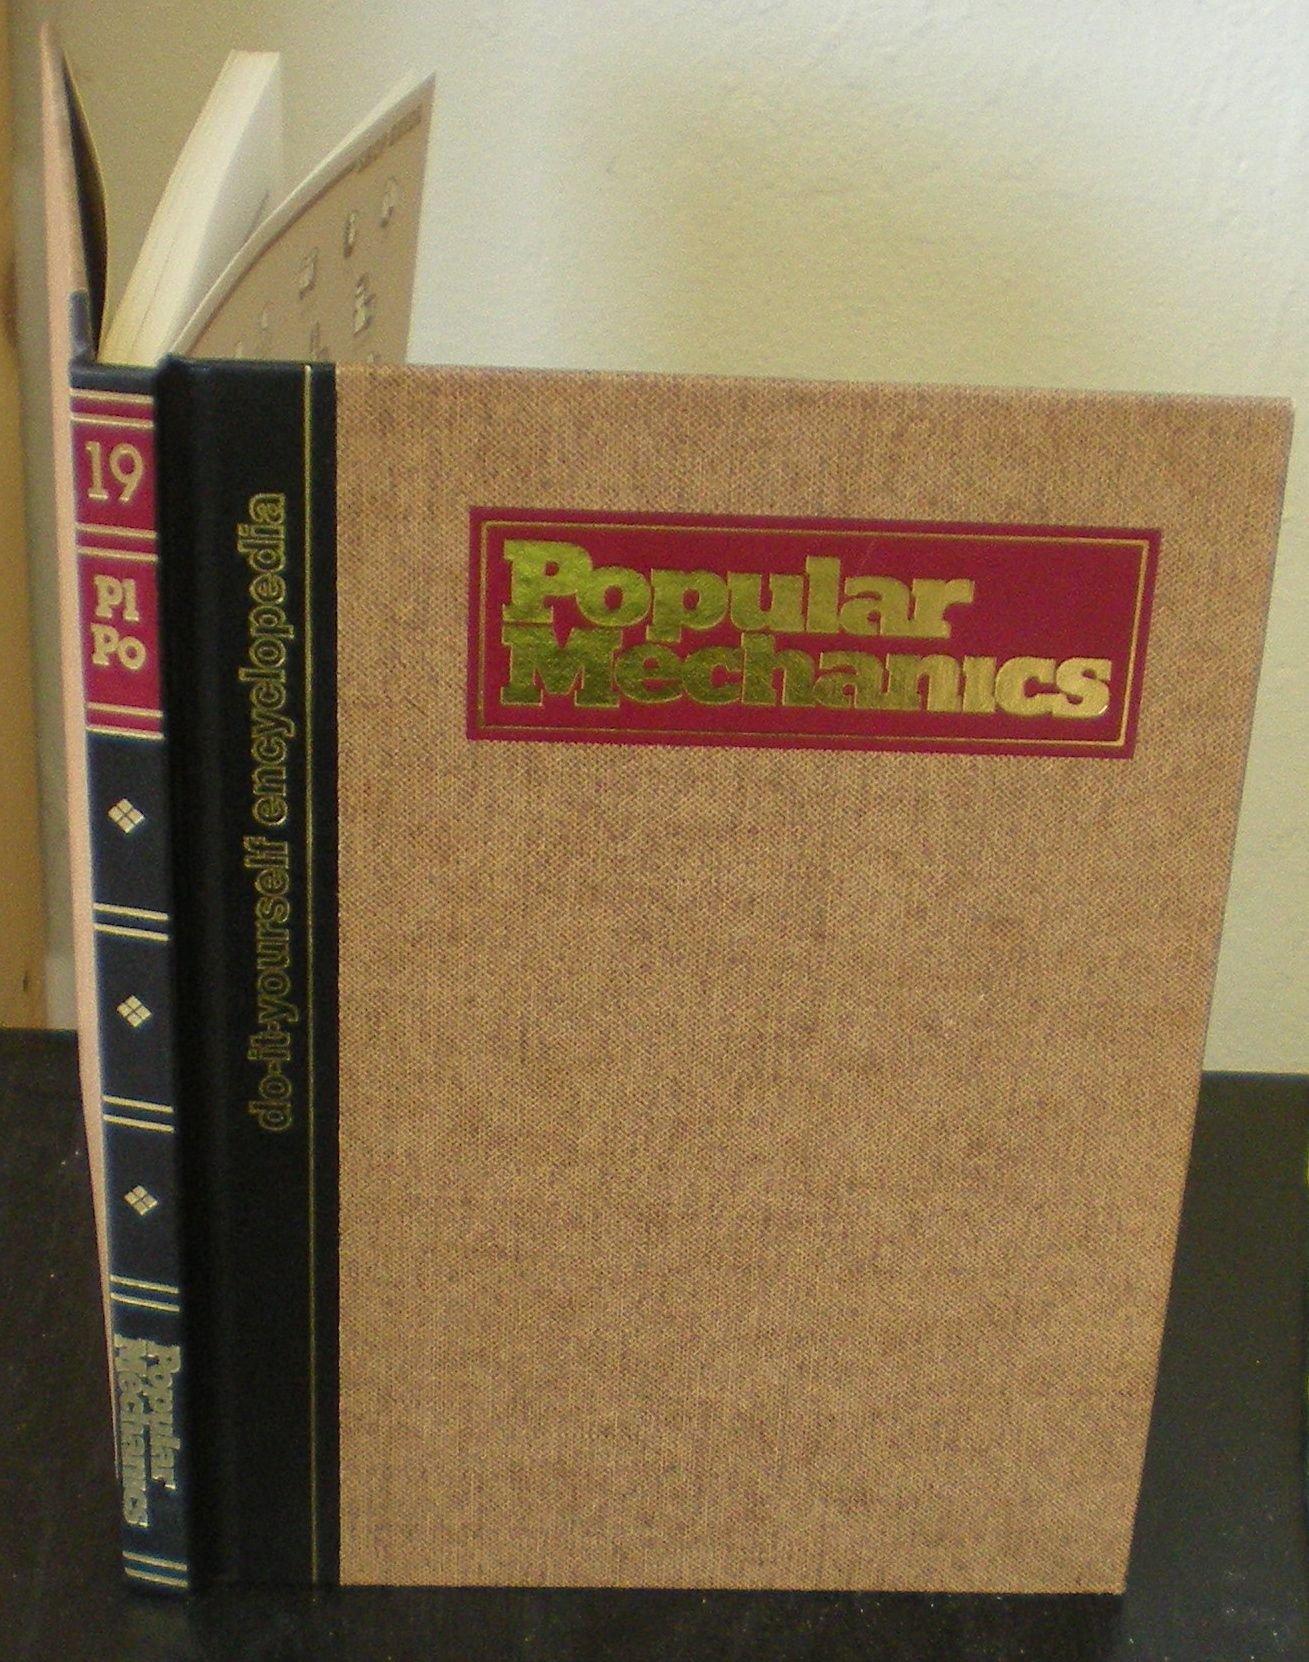 Popular Mechanics do it Yourself encyclopedia Volume 19 Plumbing to Power tools